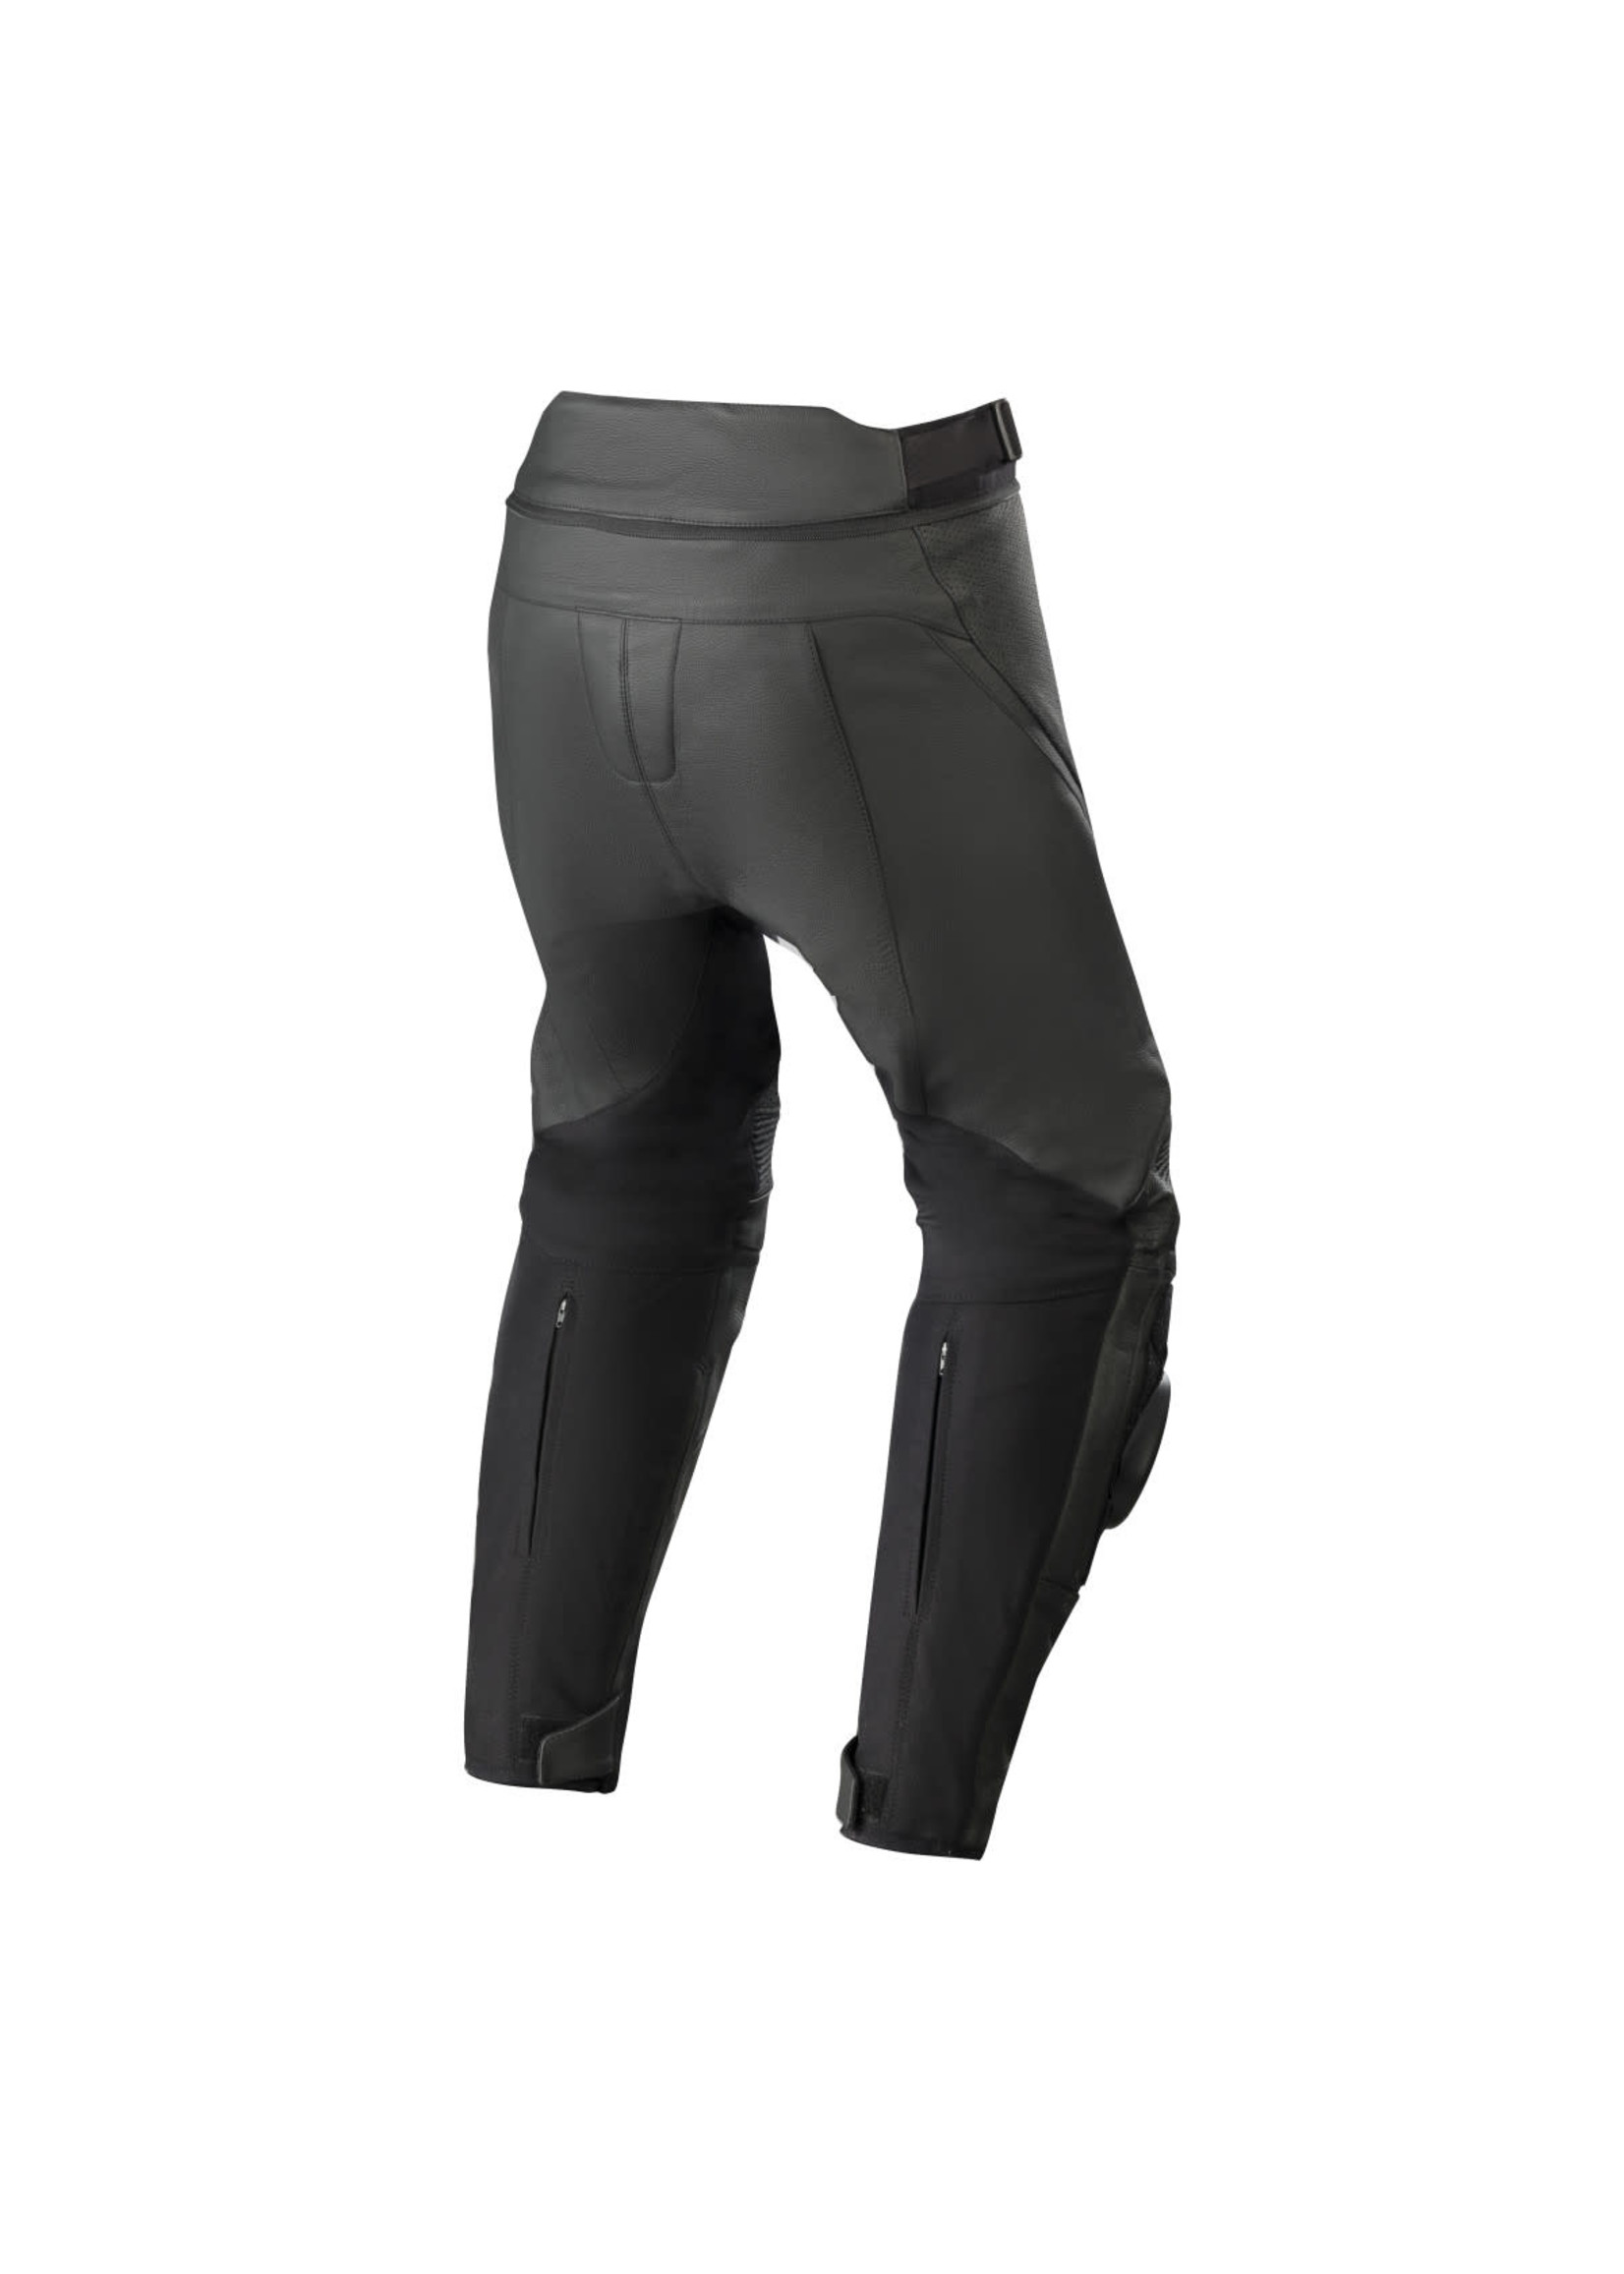 Alpinestars Women's Missile v2 Airflow Leather Riding Pants